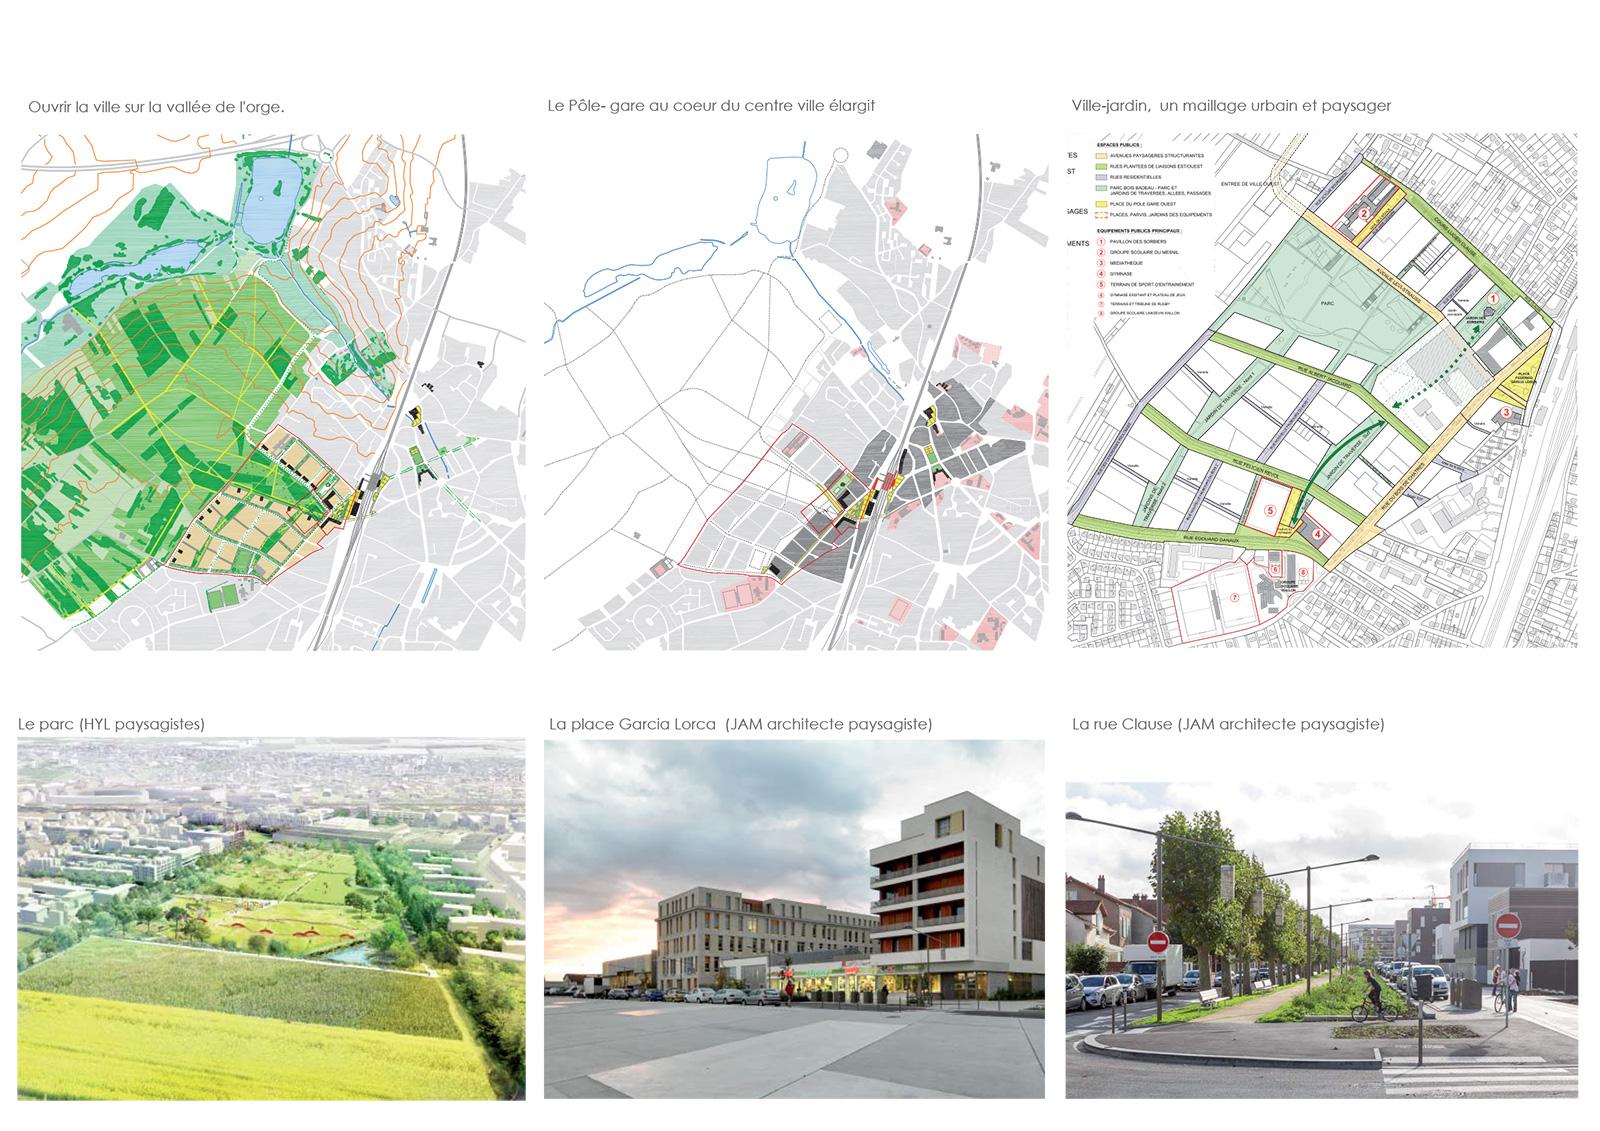 2-germe-et-jam-bretigny-clause-bois-badeau-projet-urbain-insertion-territoriale-1